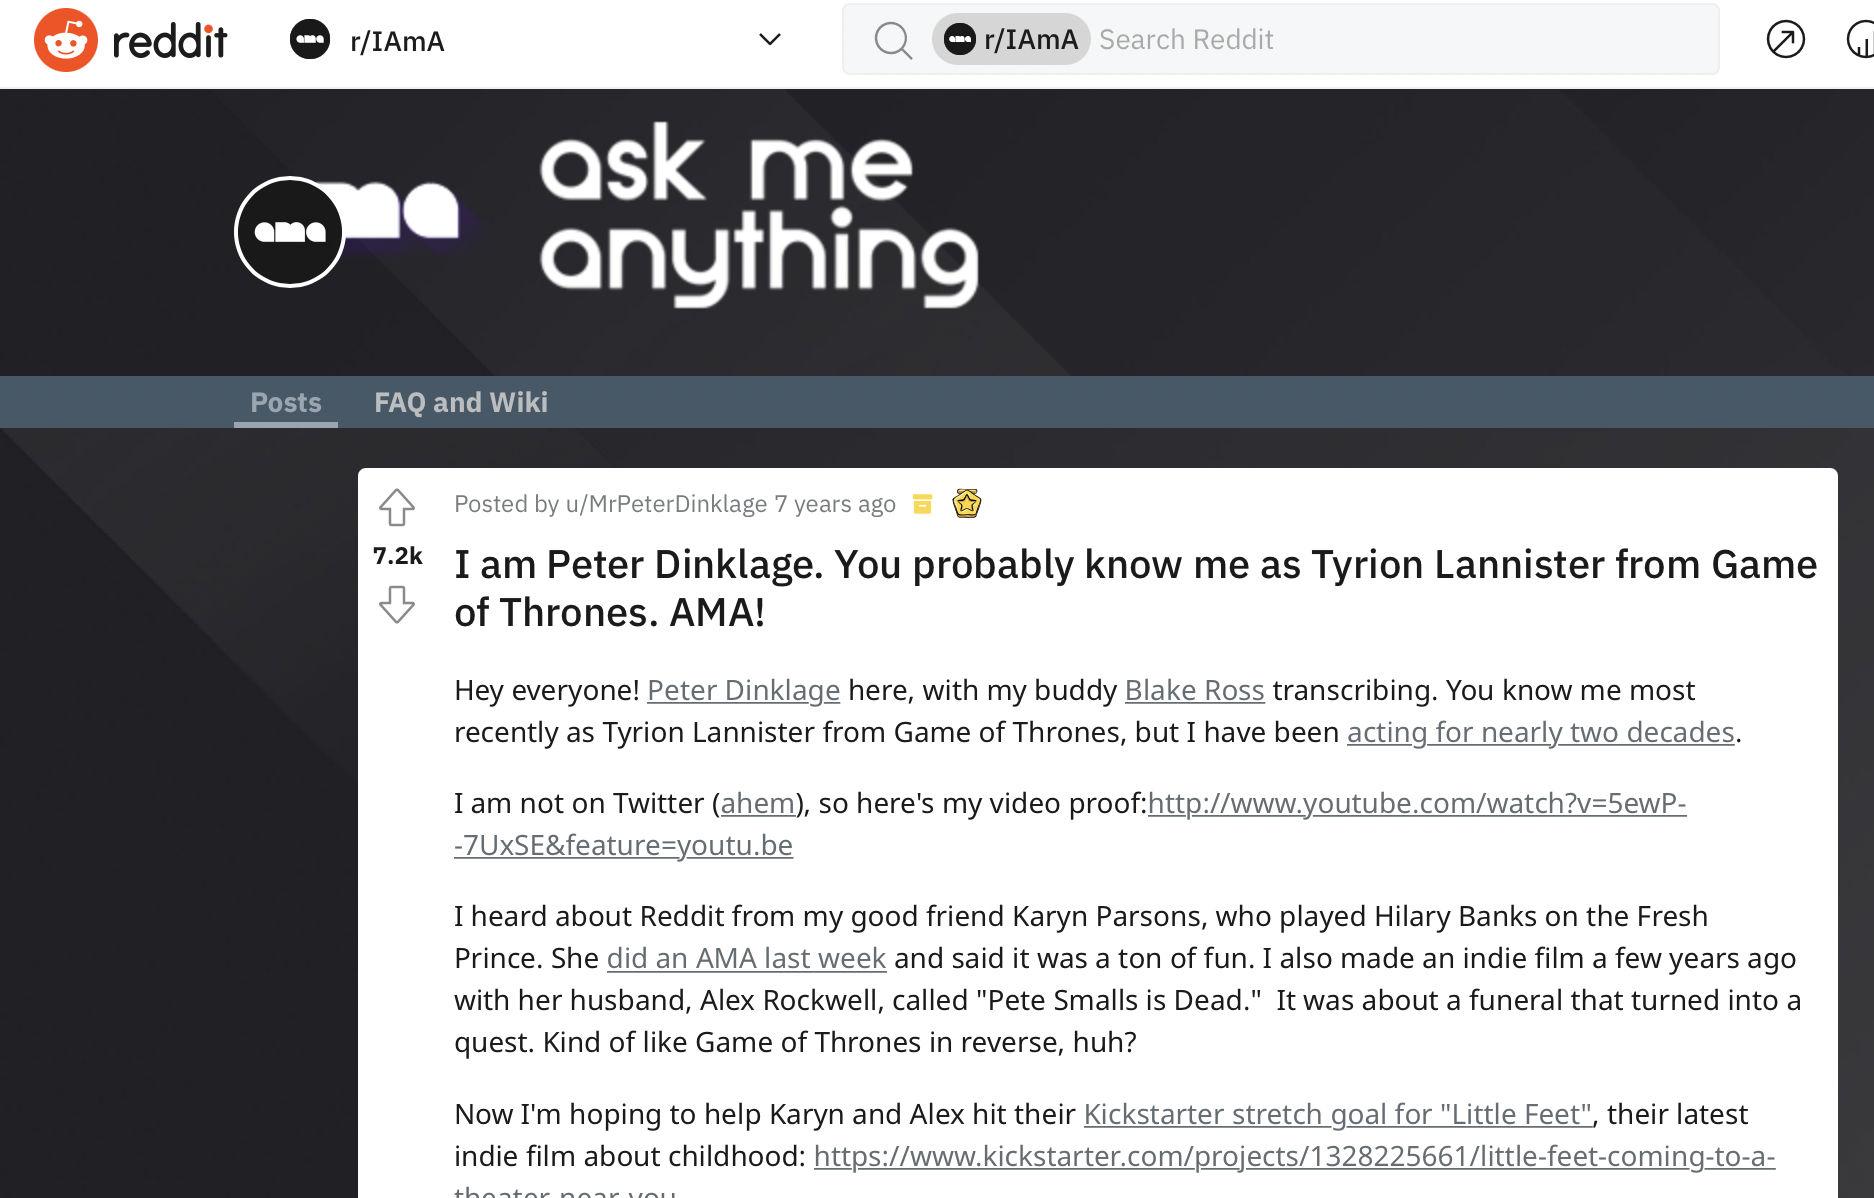 Peter Dinklage AMA on Reddit